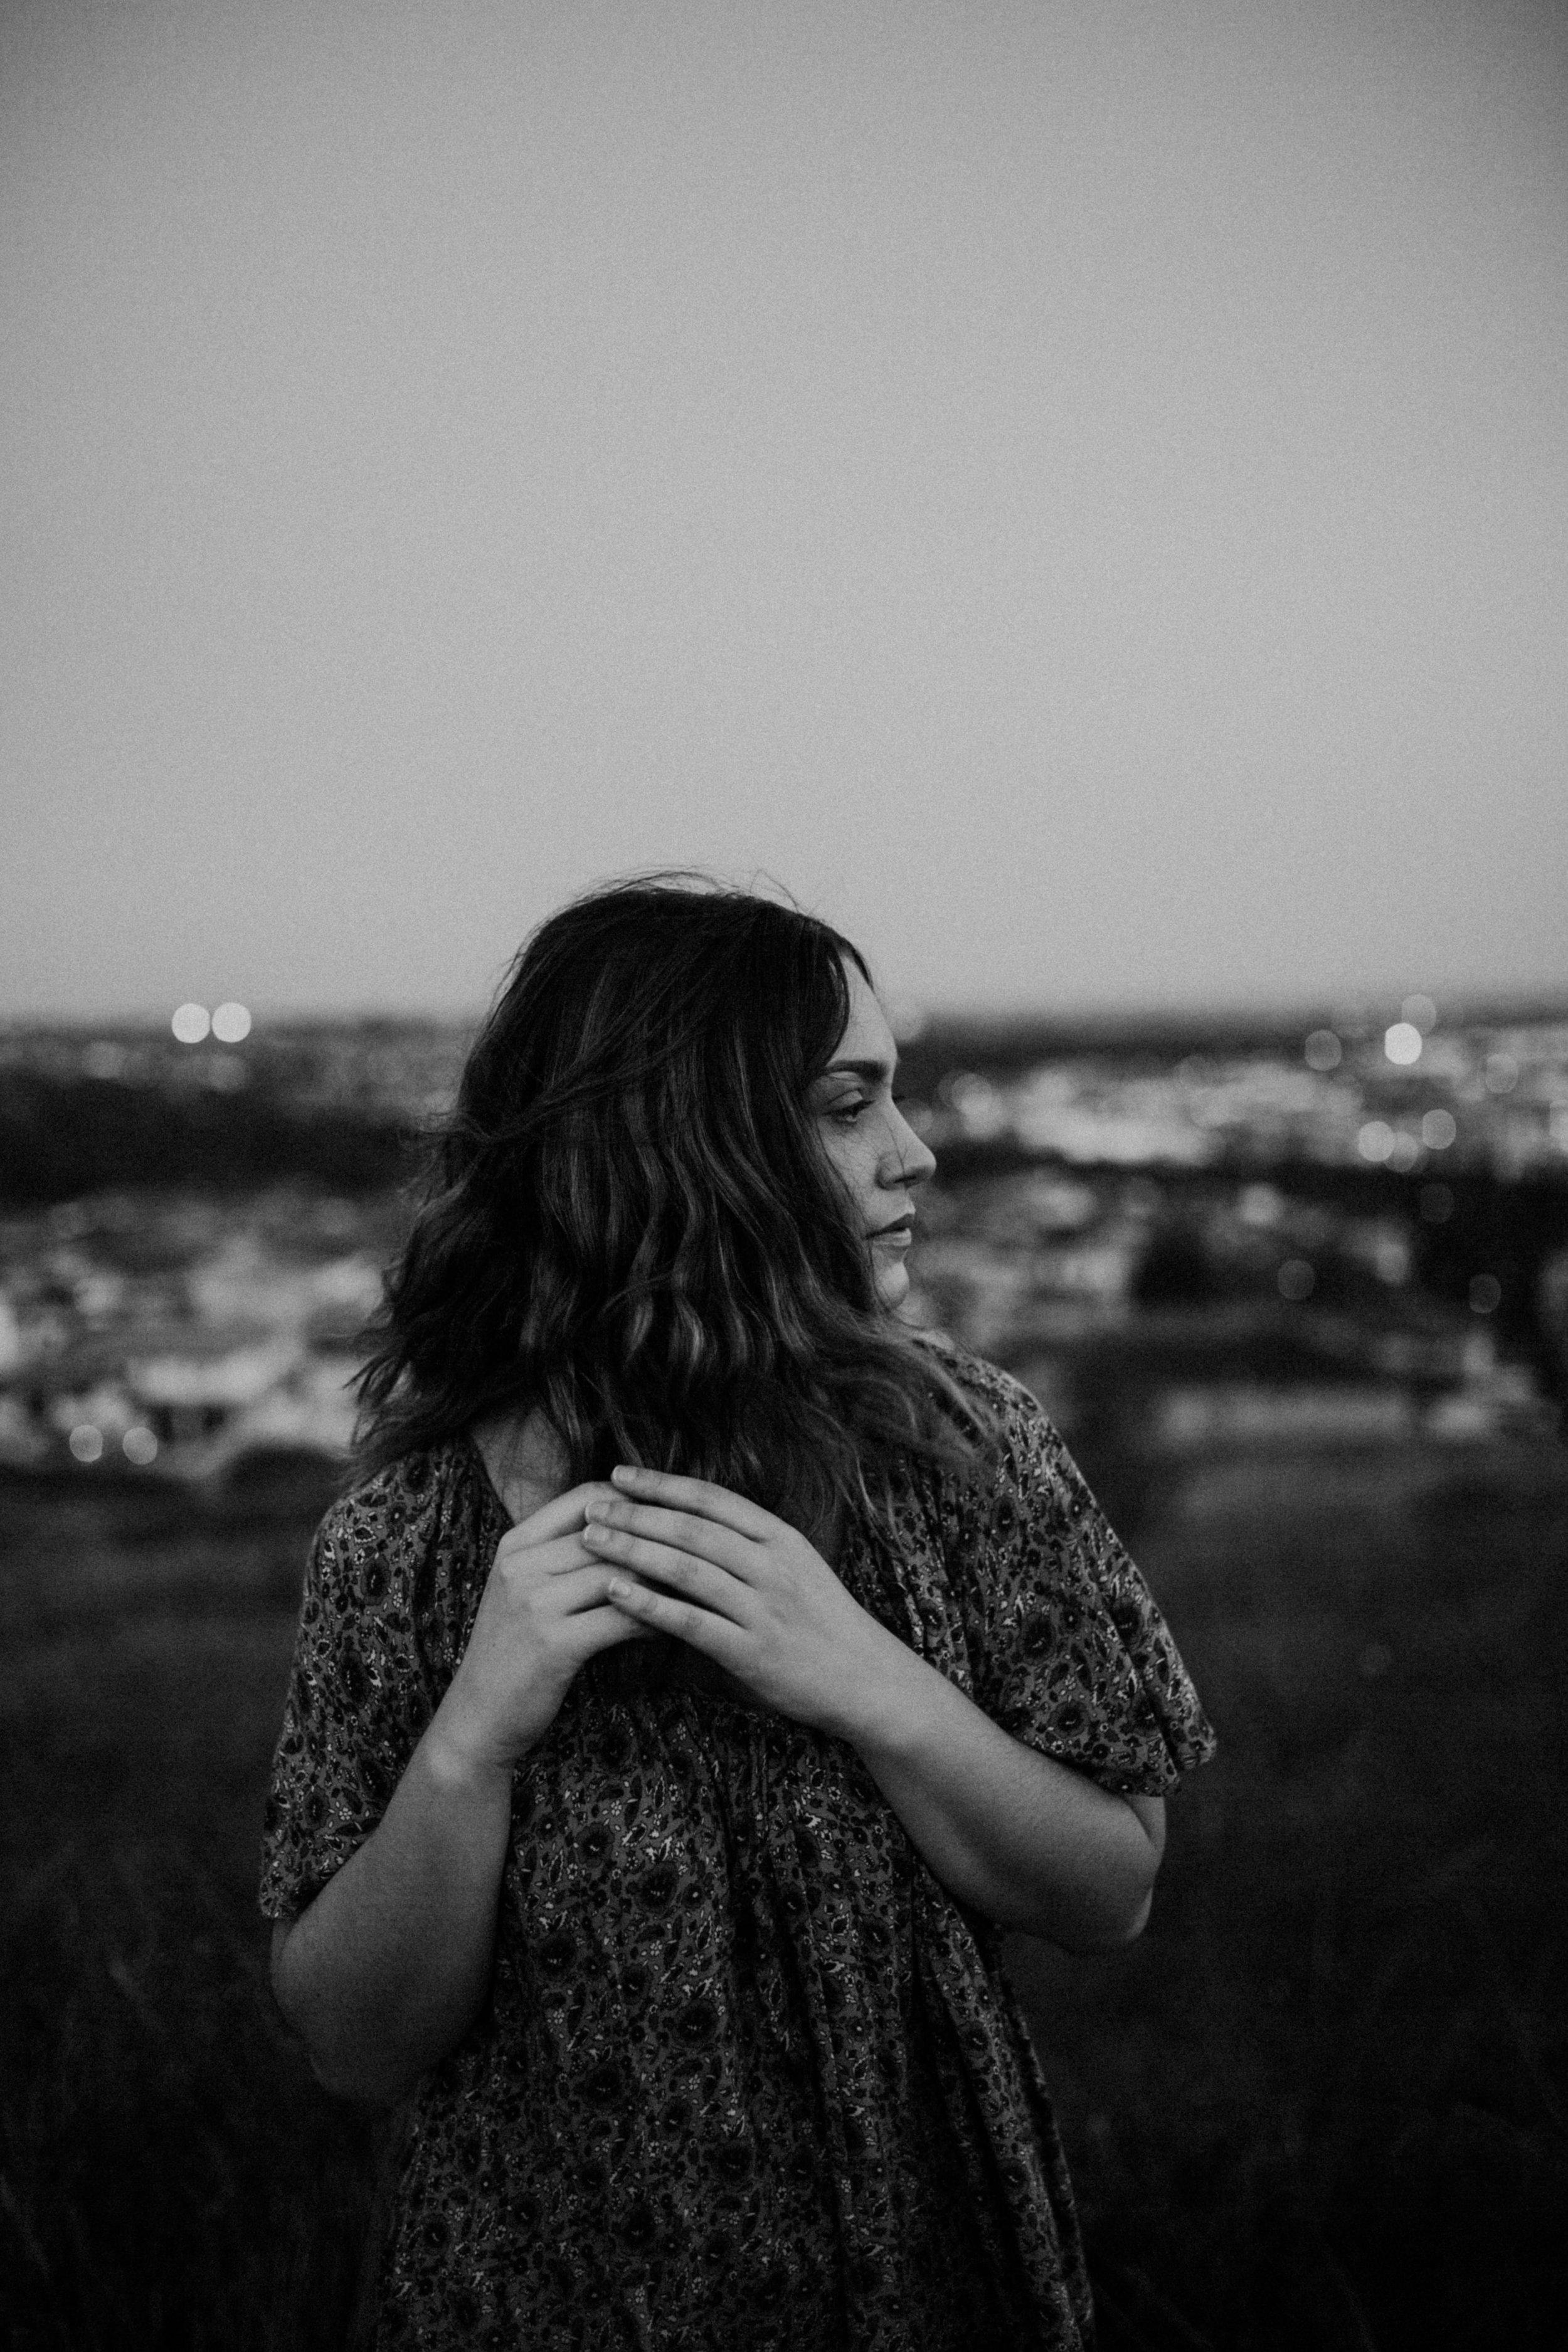 julia-trotti-by-kiara00075.jpg